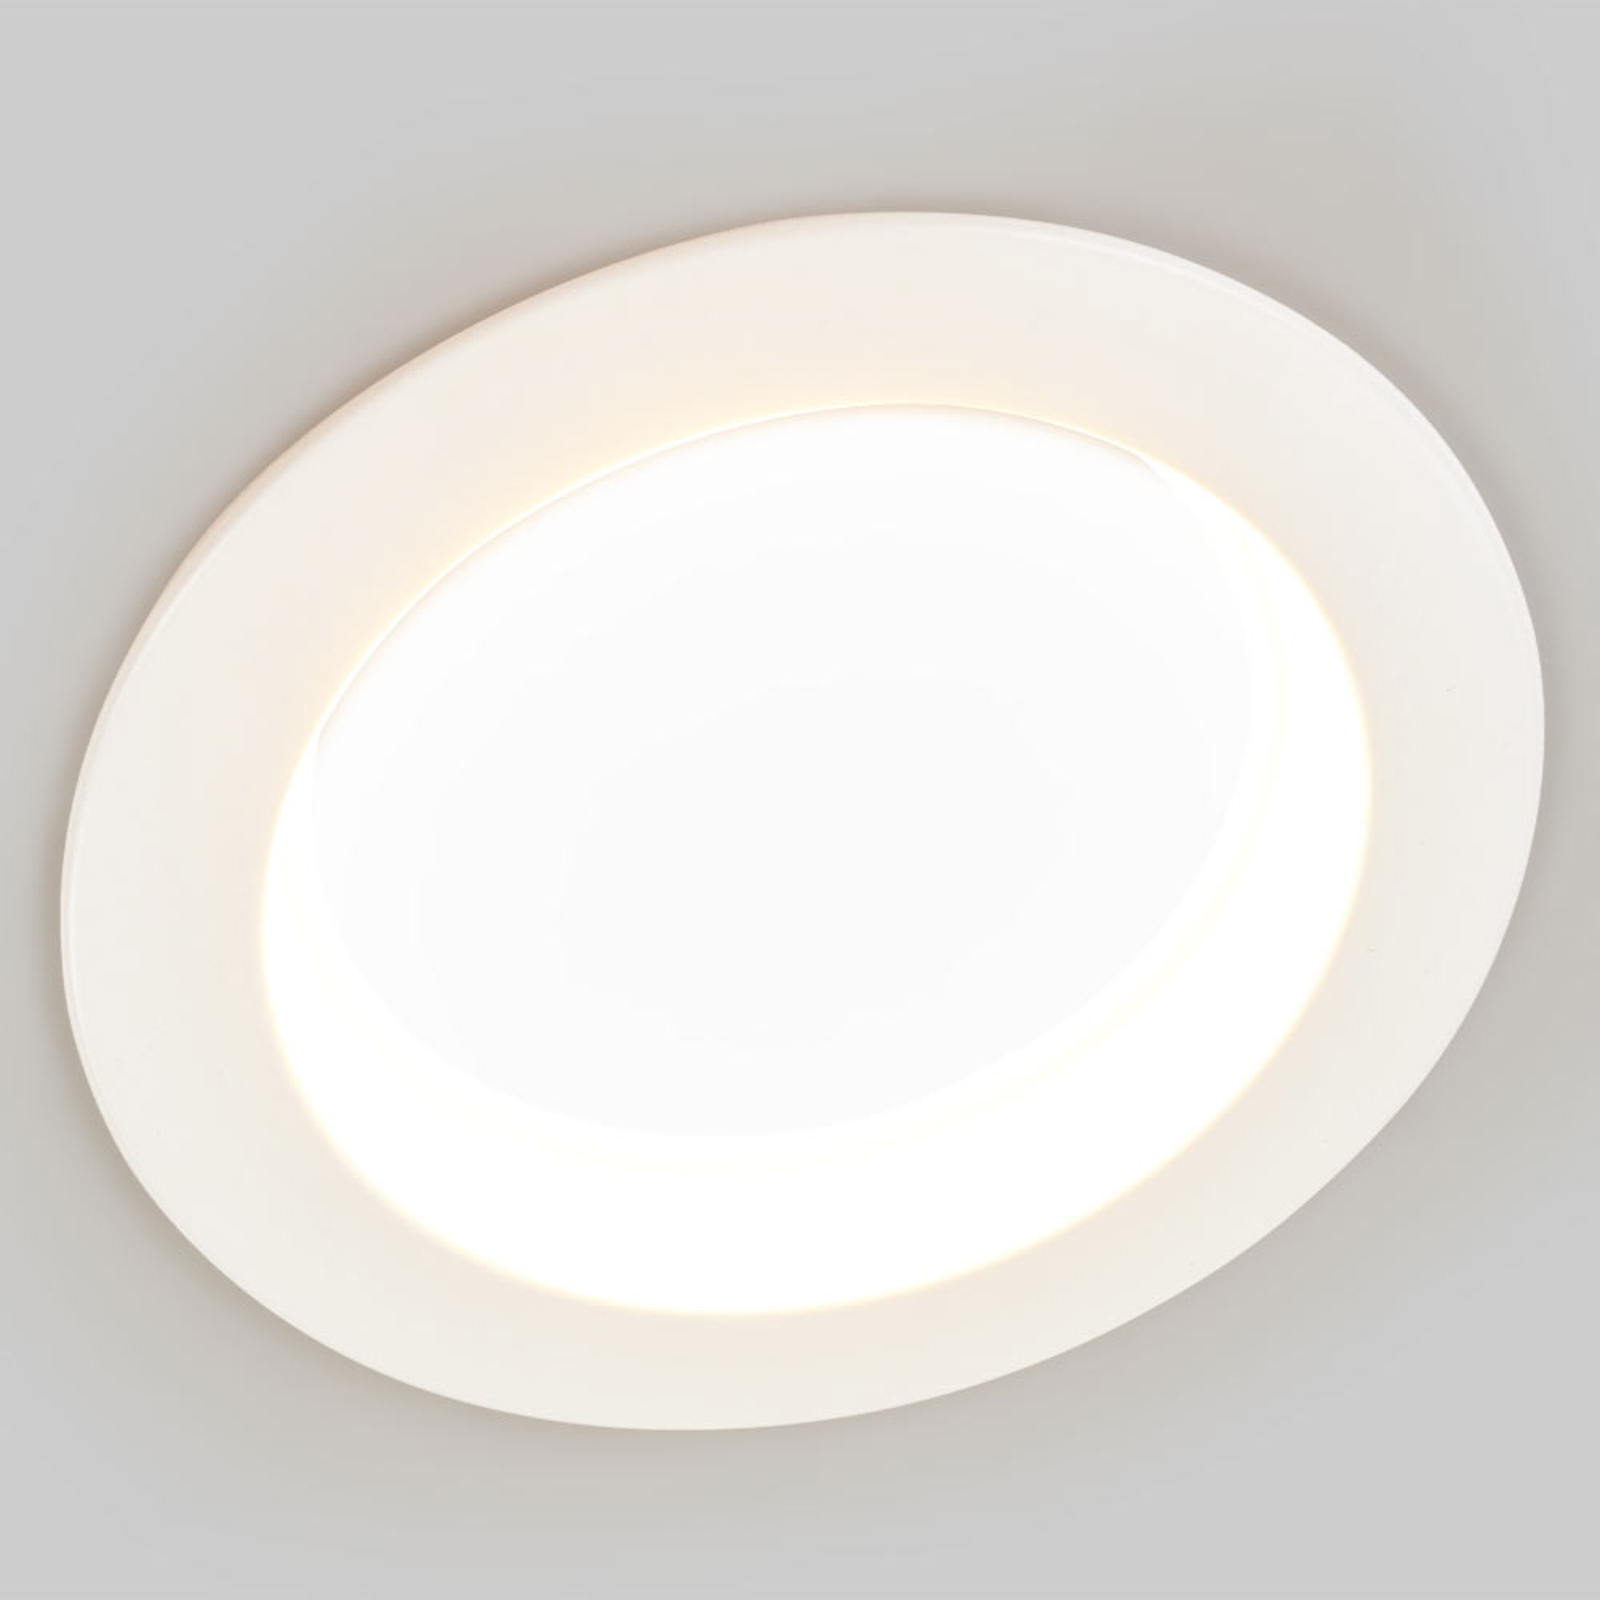 Piet LED innfellingsspot 27W, 3000K 4000K 6000K